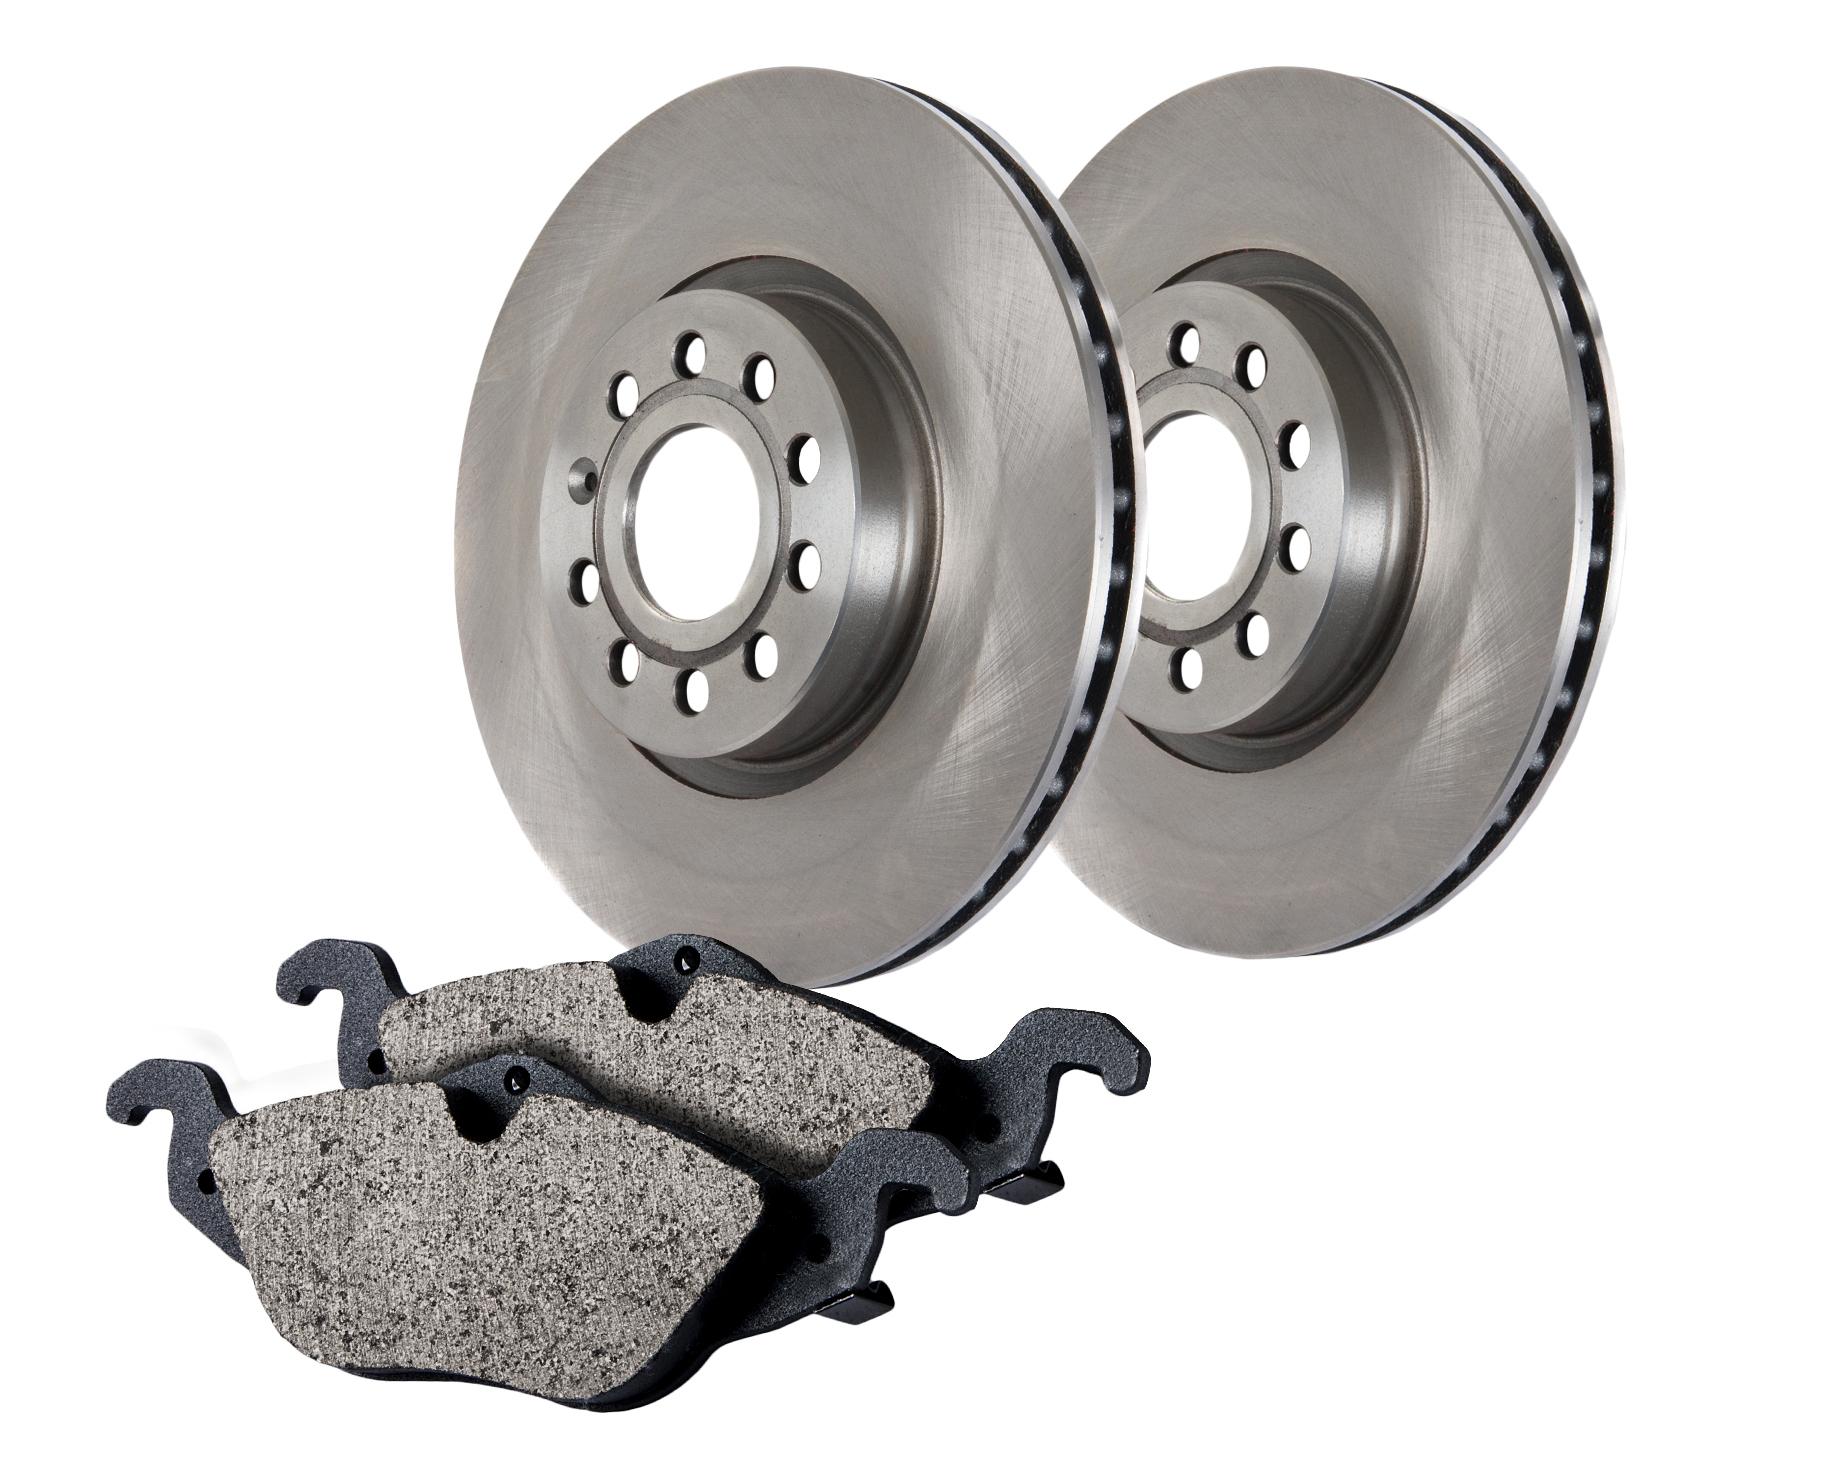 Centric Brake Parts 905.50013 Brake Rotor and Pad Kit, Premium, Semi-Metallic Pads, Iron, Natural, Kia Spectra 2004-09, Kit